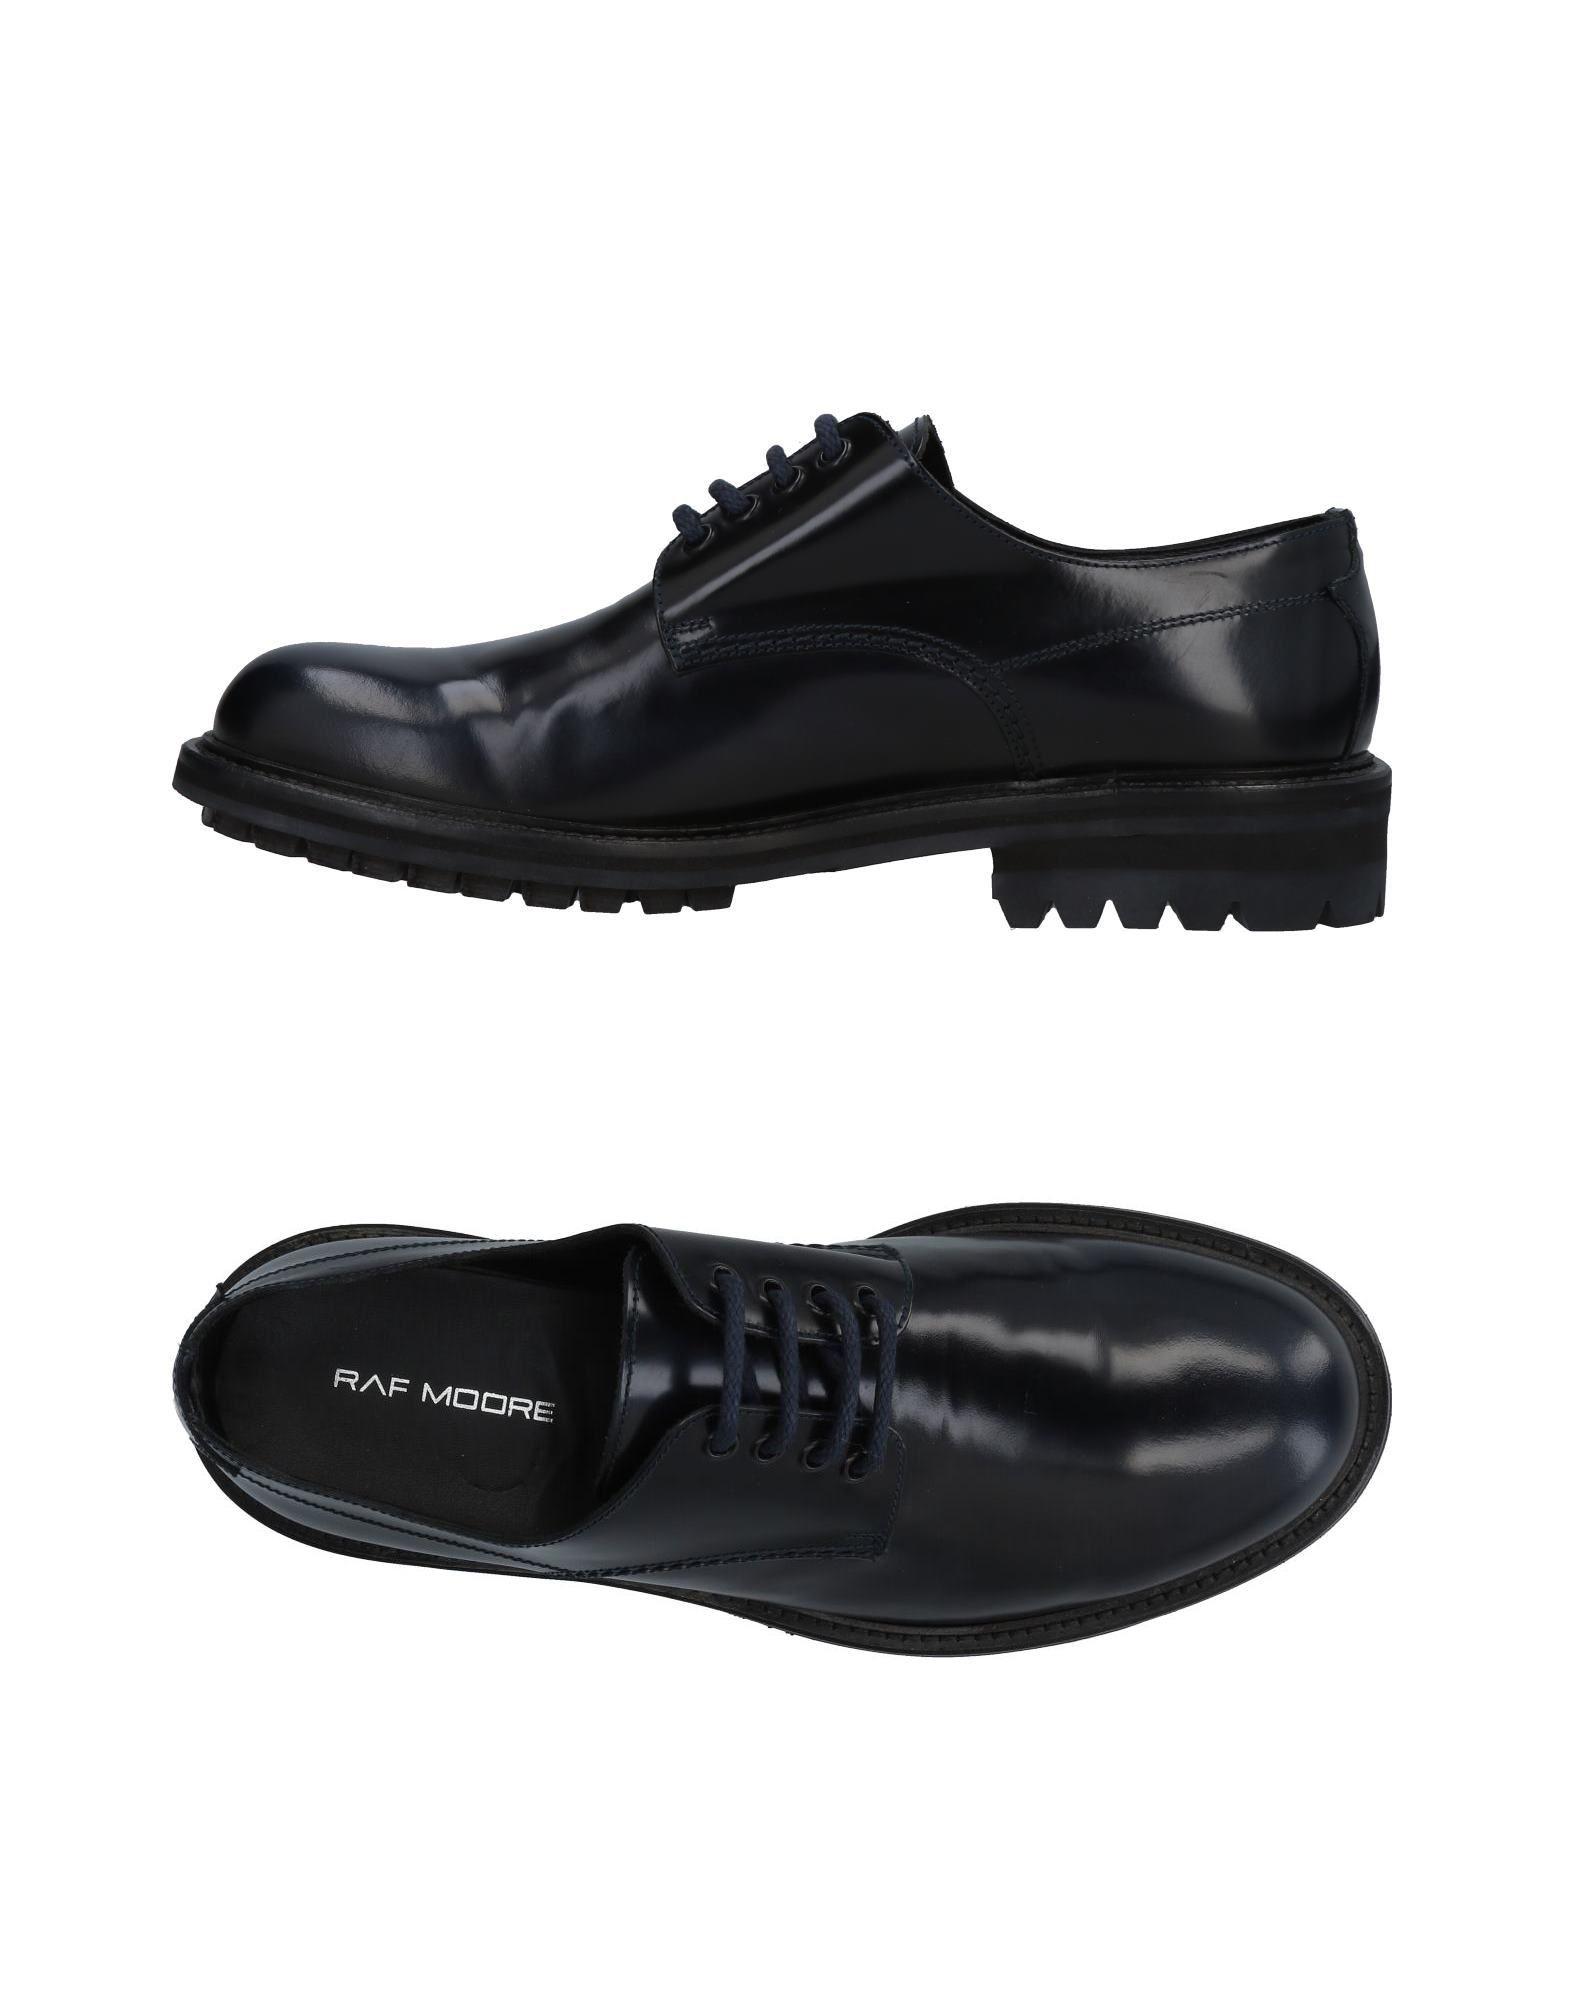 RAF MOORE Обувь на шнурках гэри мур gary moore old new ballads blues